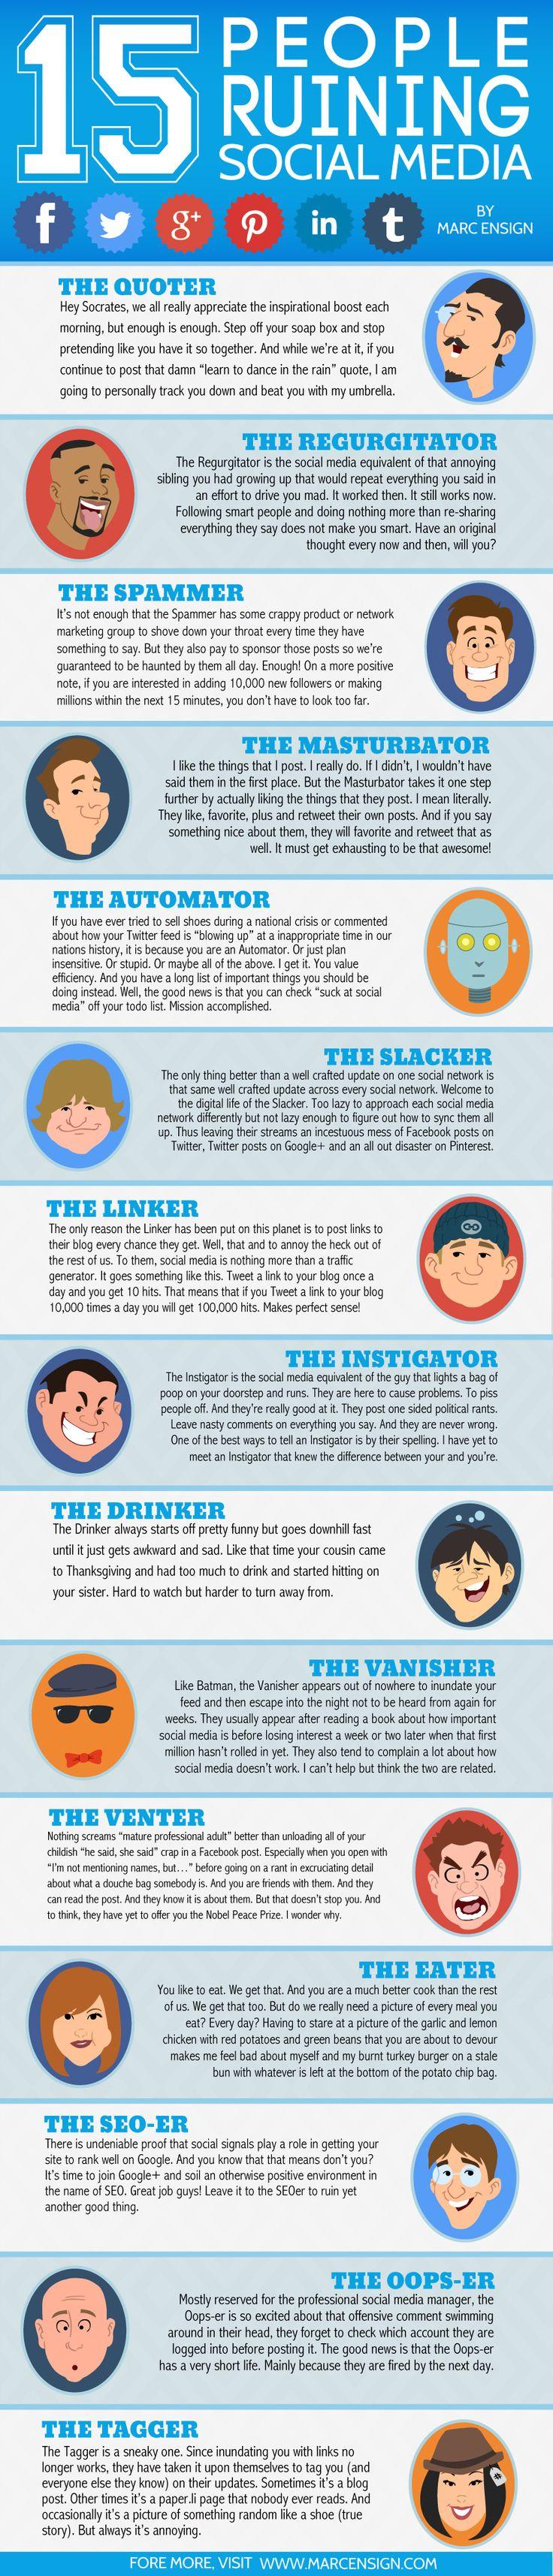 15 People Ruining #SocialMedia #Infographic